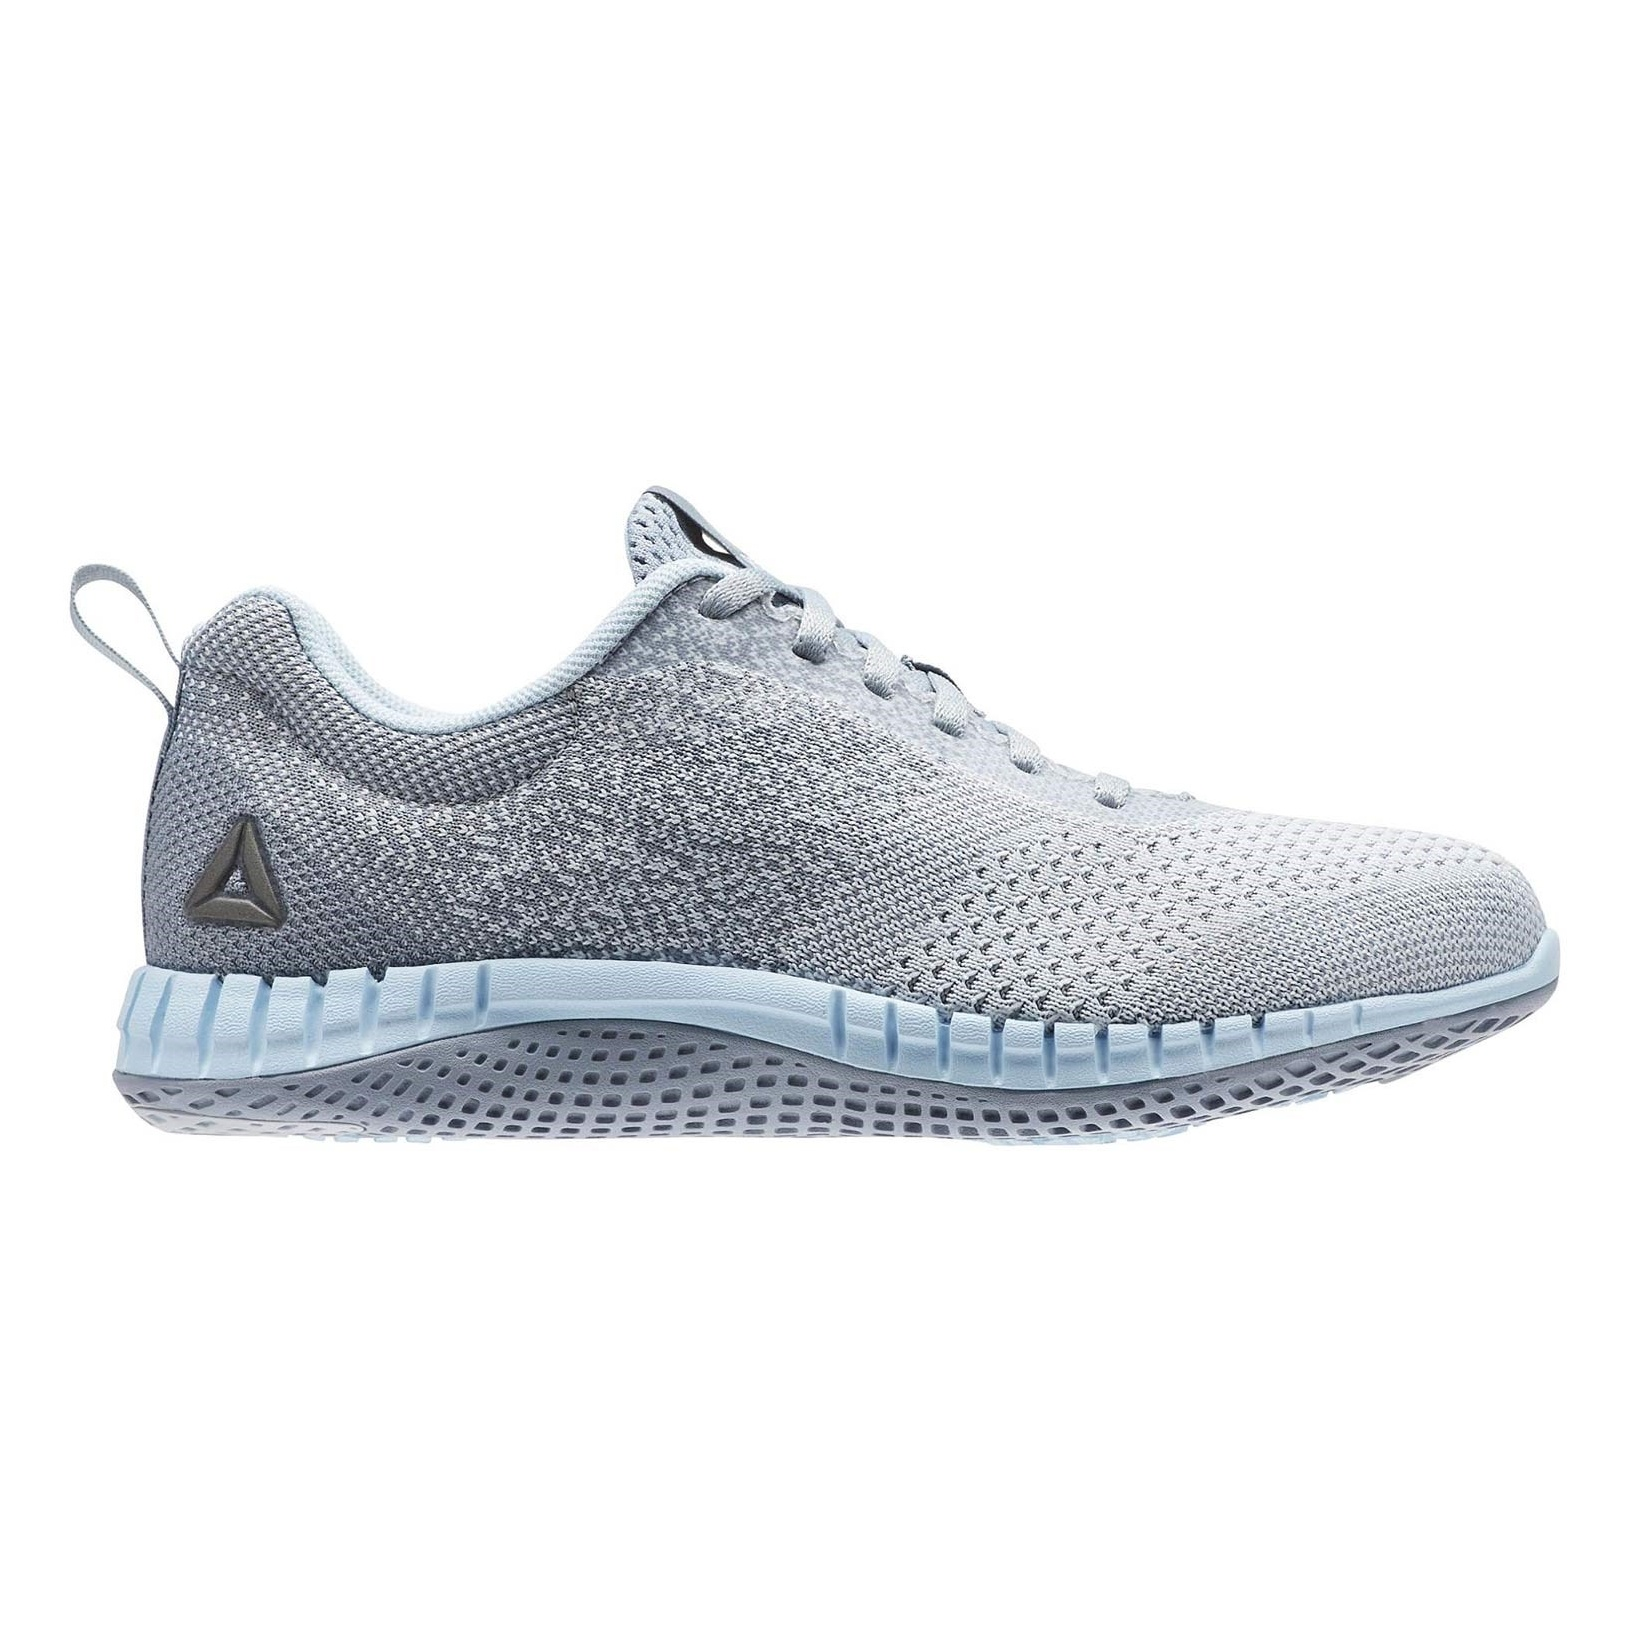 کفش دویدن بندی زنانه Run Prime Ultraknit - ریباک